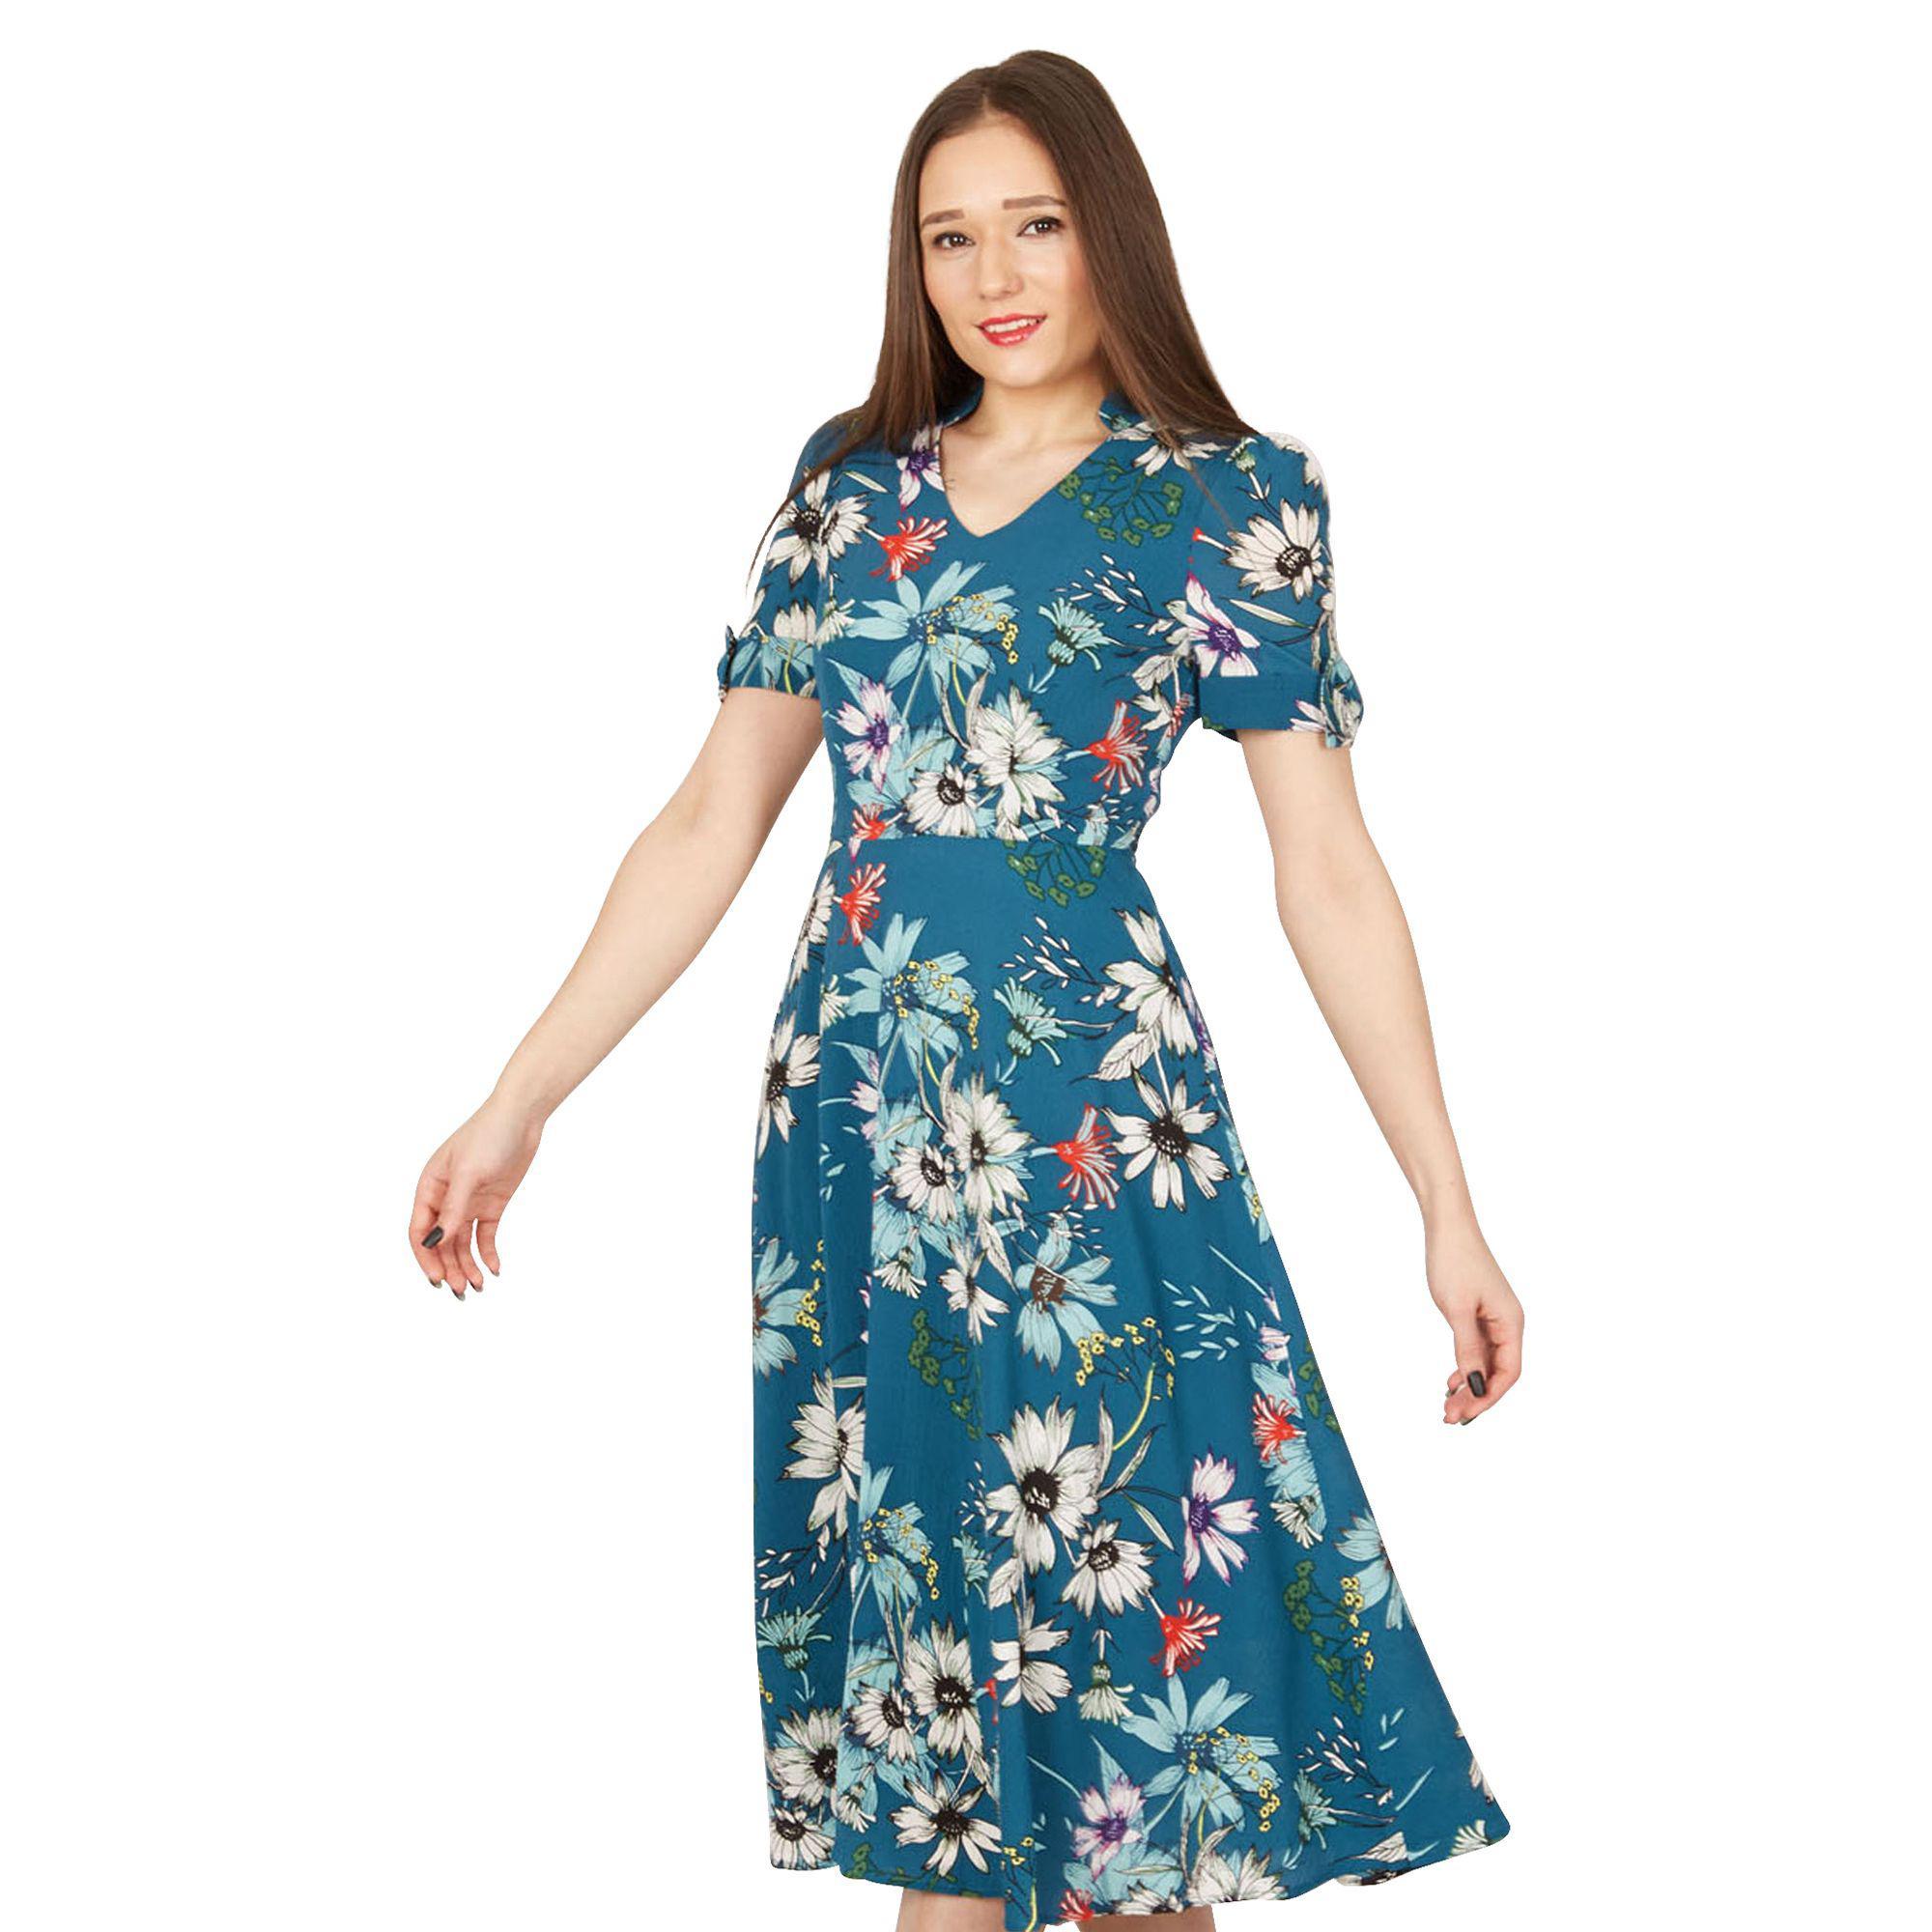 c7ca535f7471 Jolie Moi Multicoloured Floral Print Bow Detail Tea Dress in Blue - Lyst